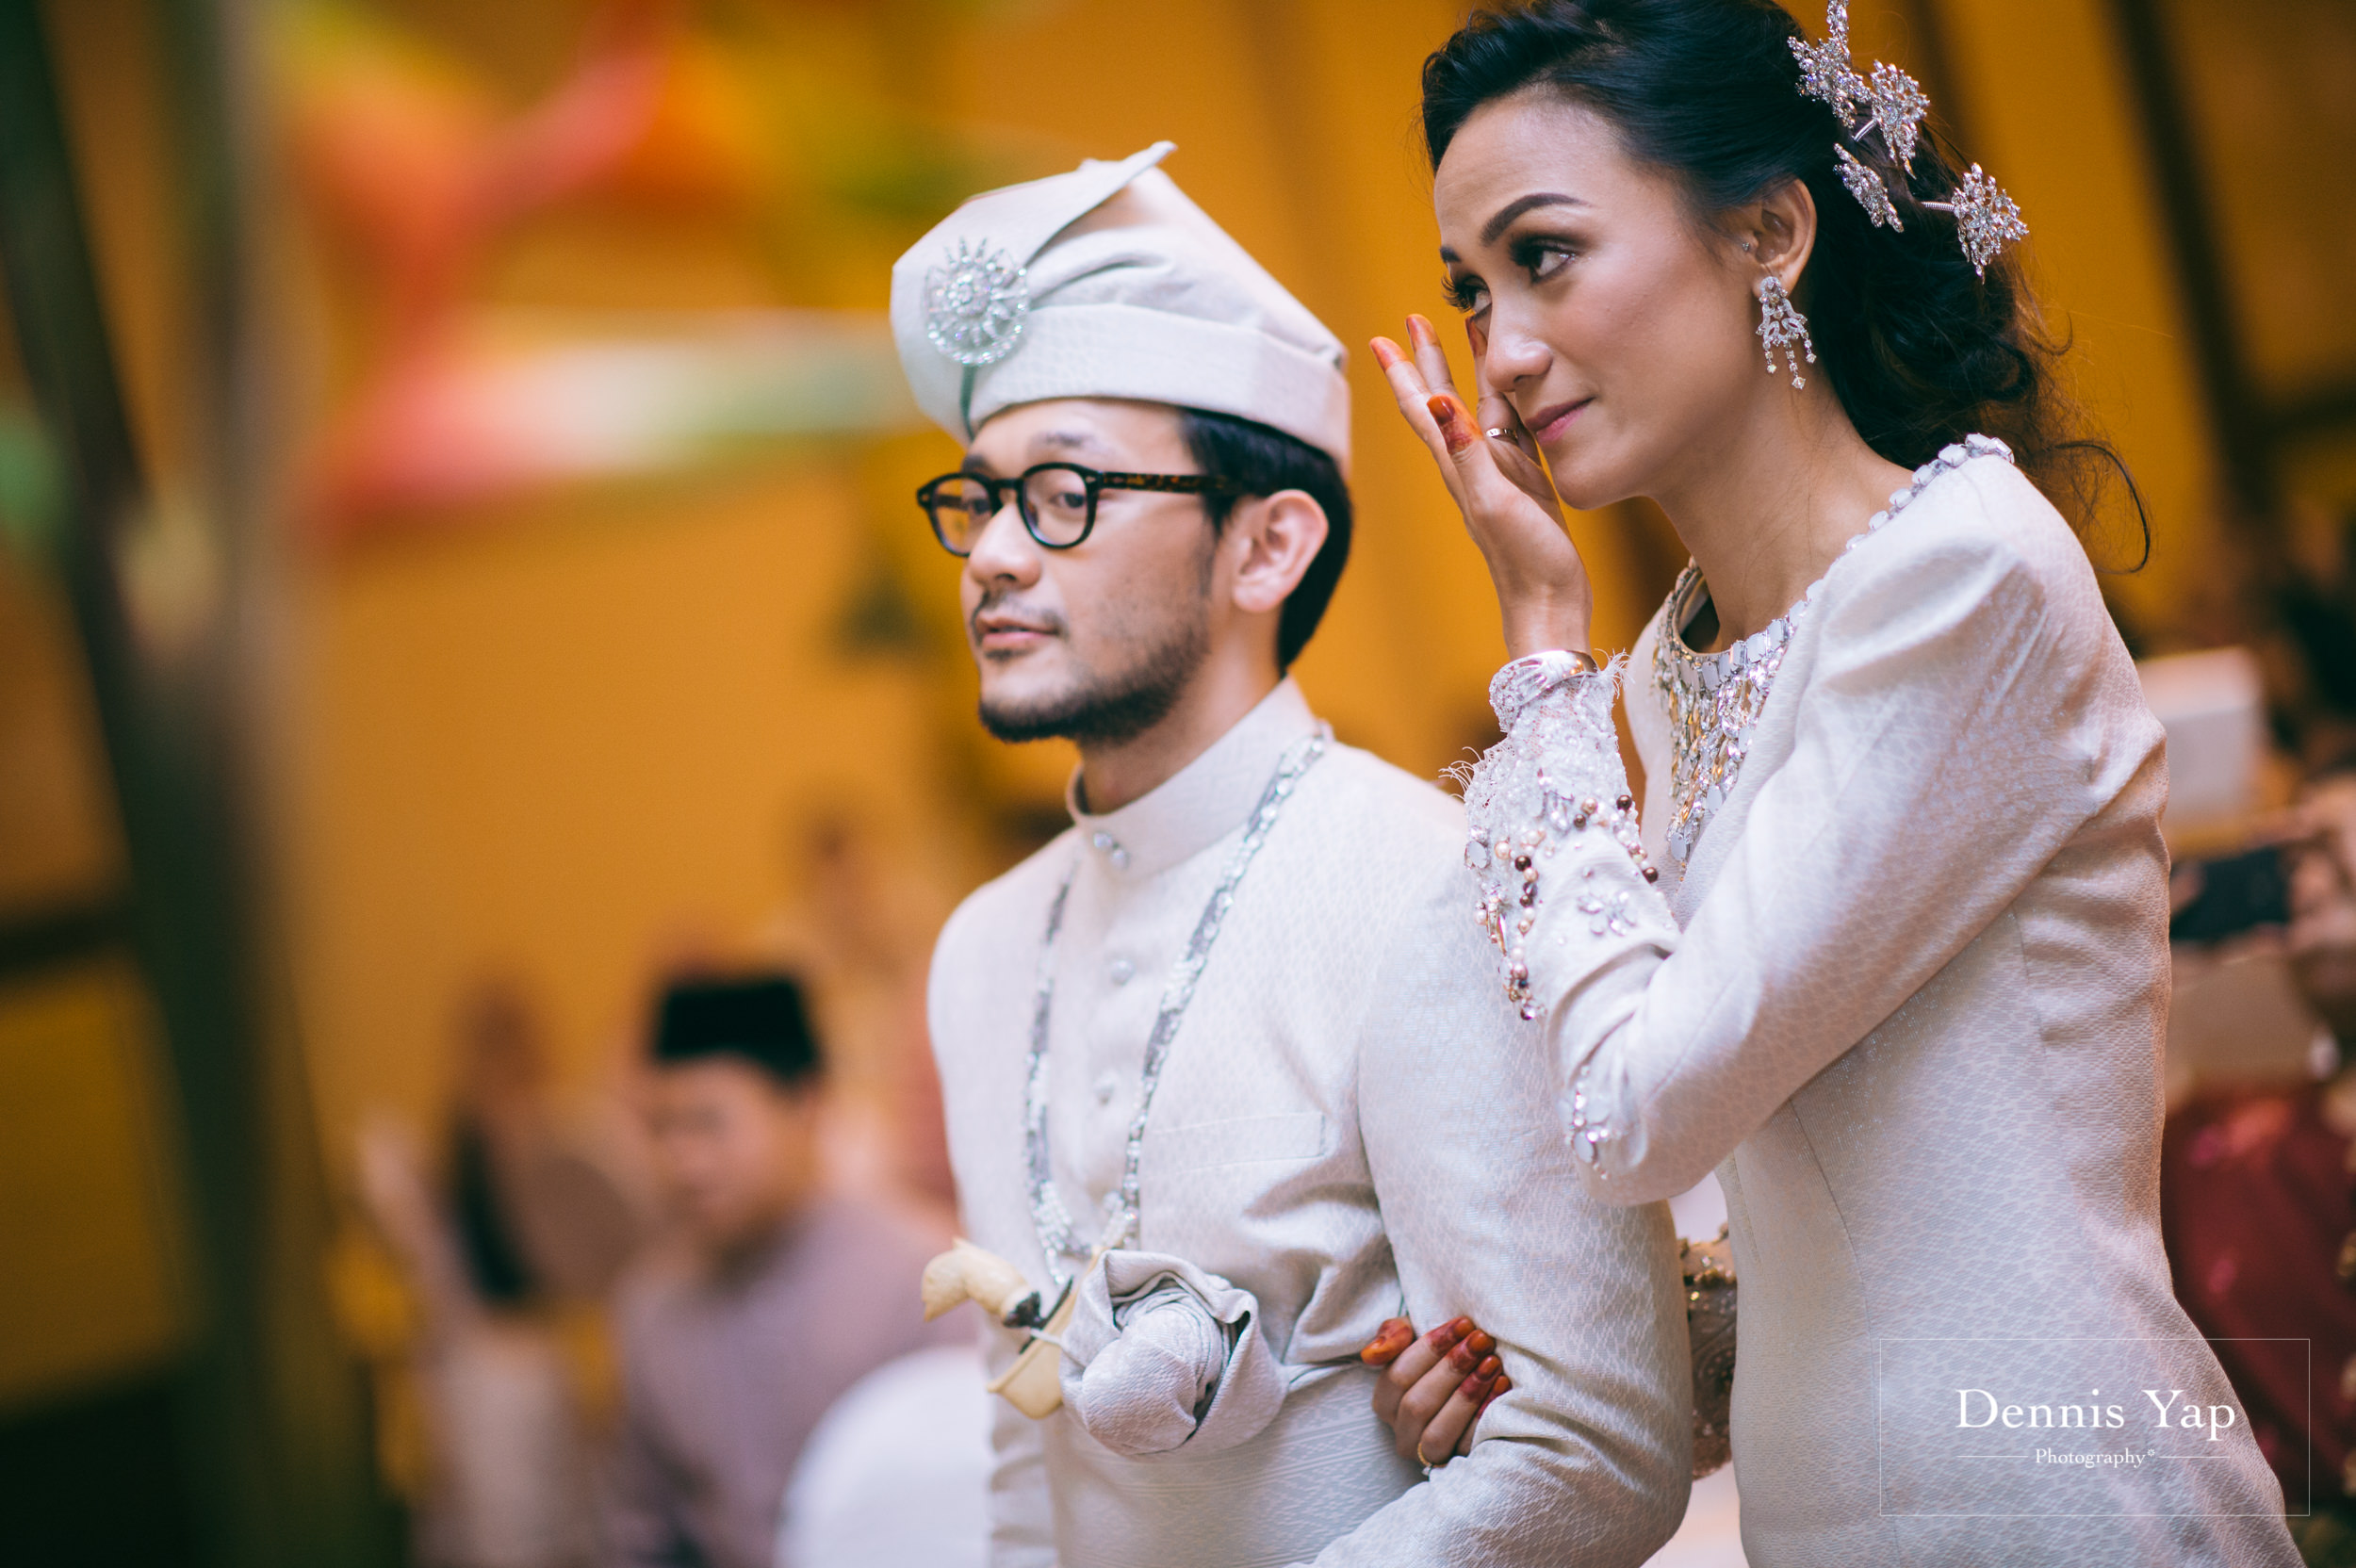 zarif hanalili malay wedding blessing ceremony dennis yap photography-22.jpg